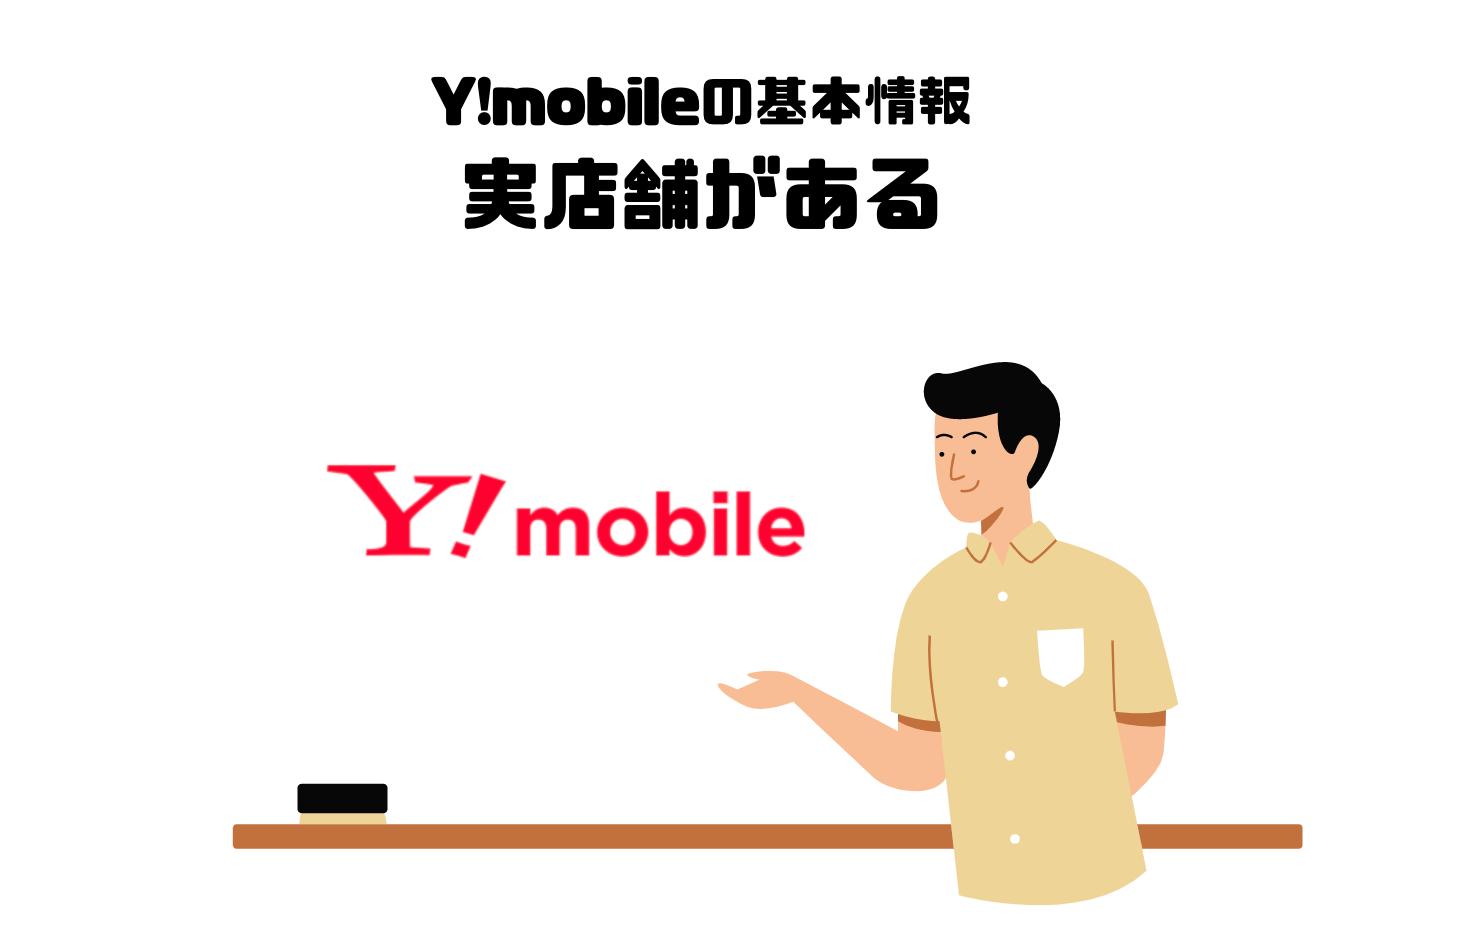 Y!mobile_ワイモバイル_通信速度_速度_SoftBank_実店舗